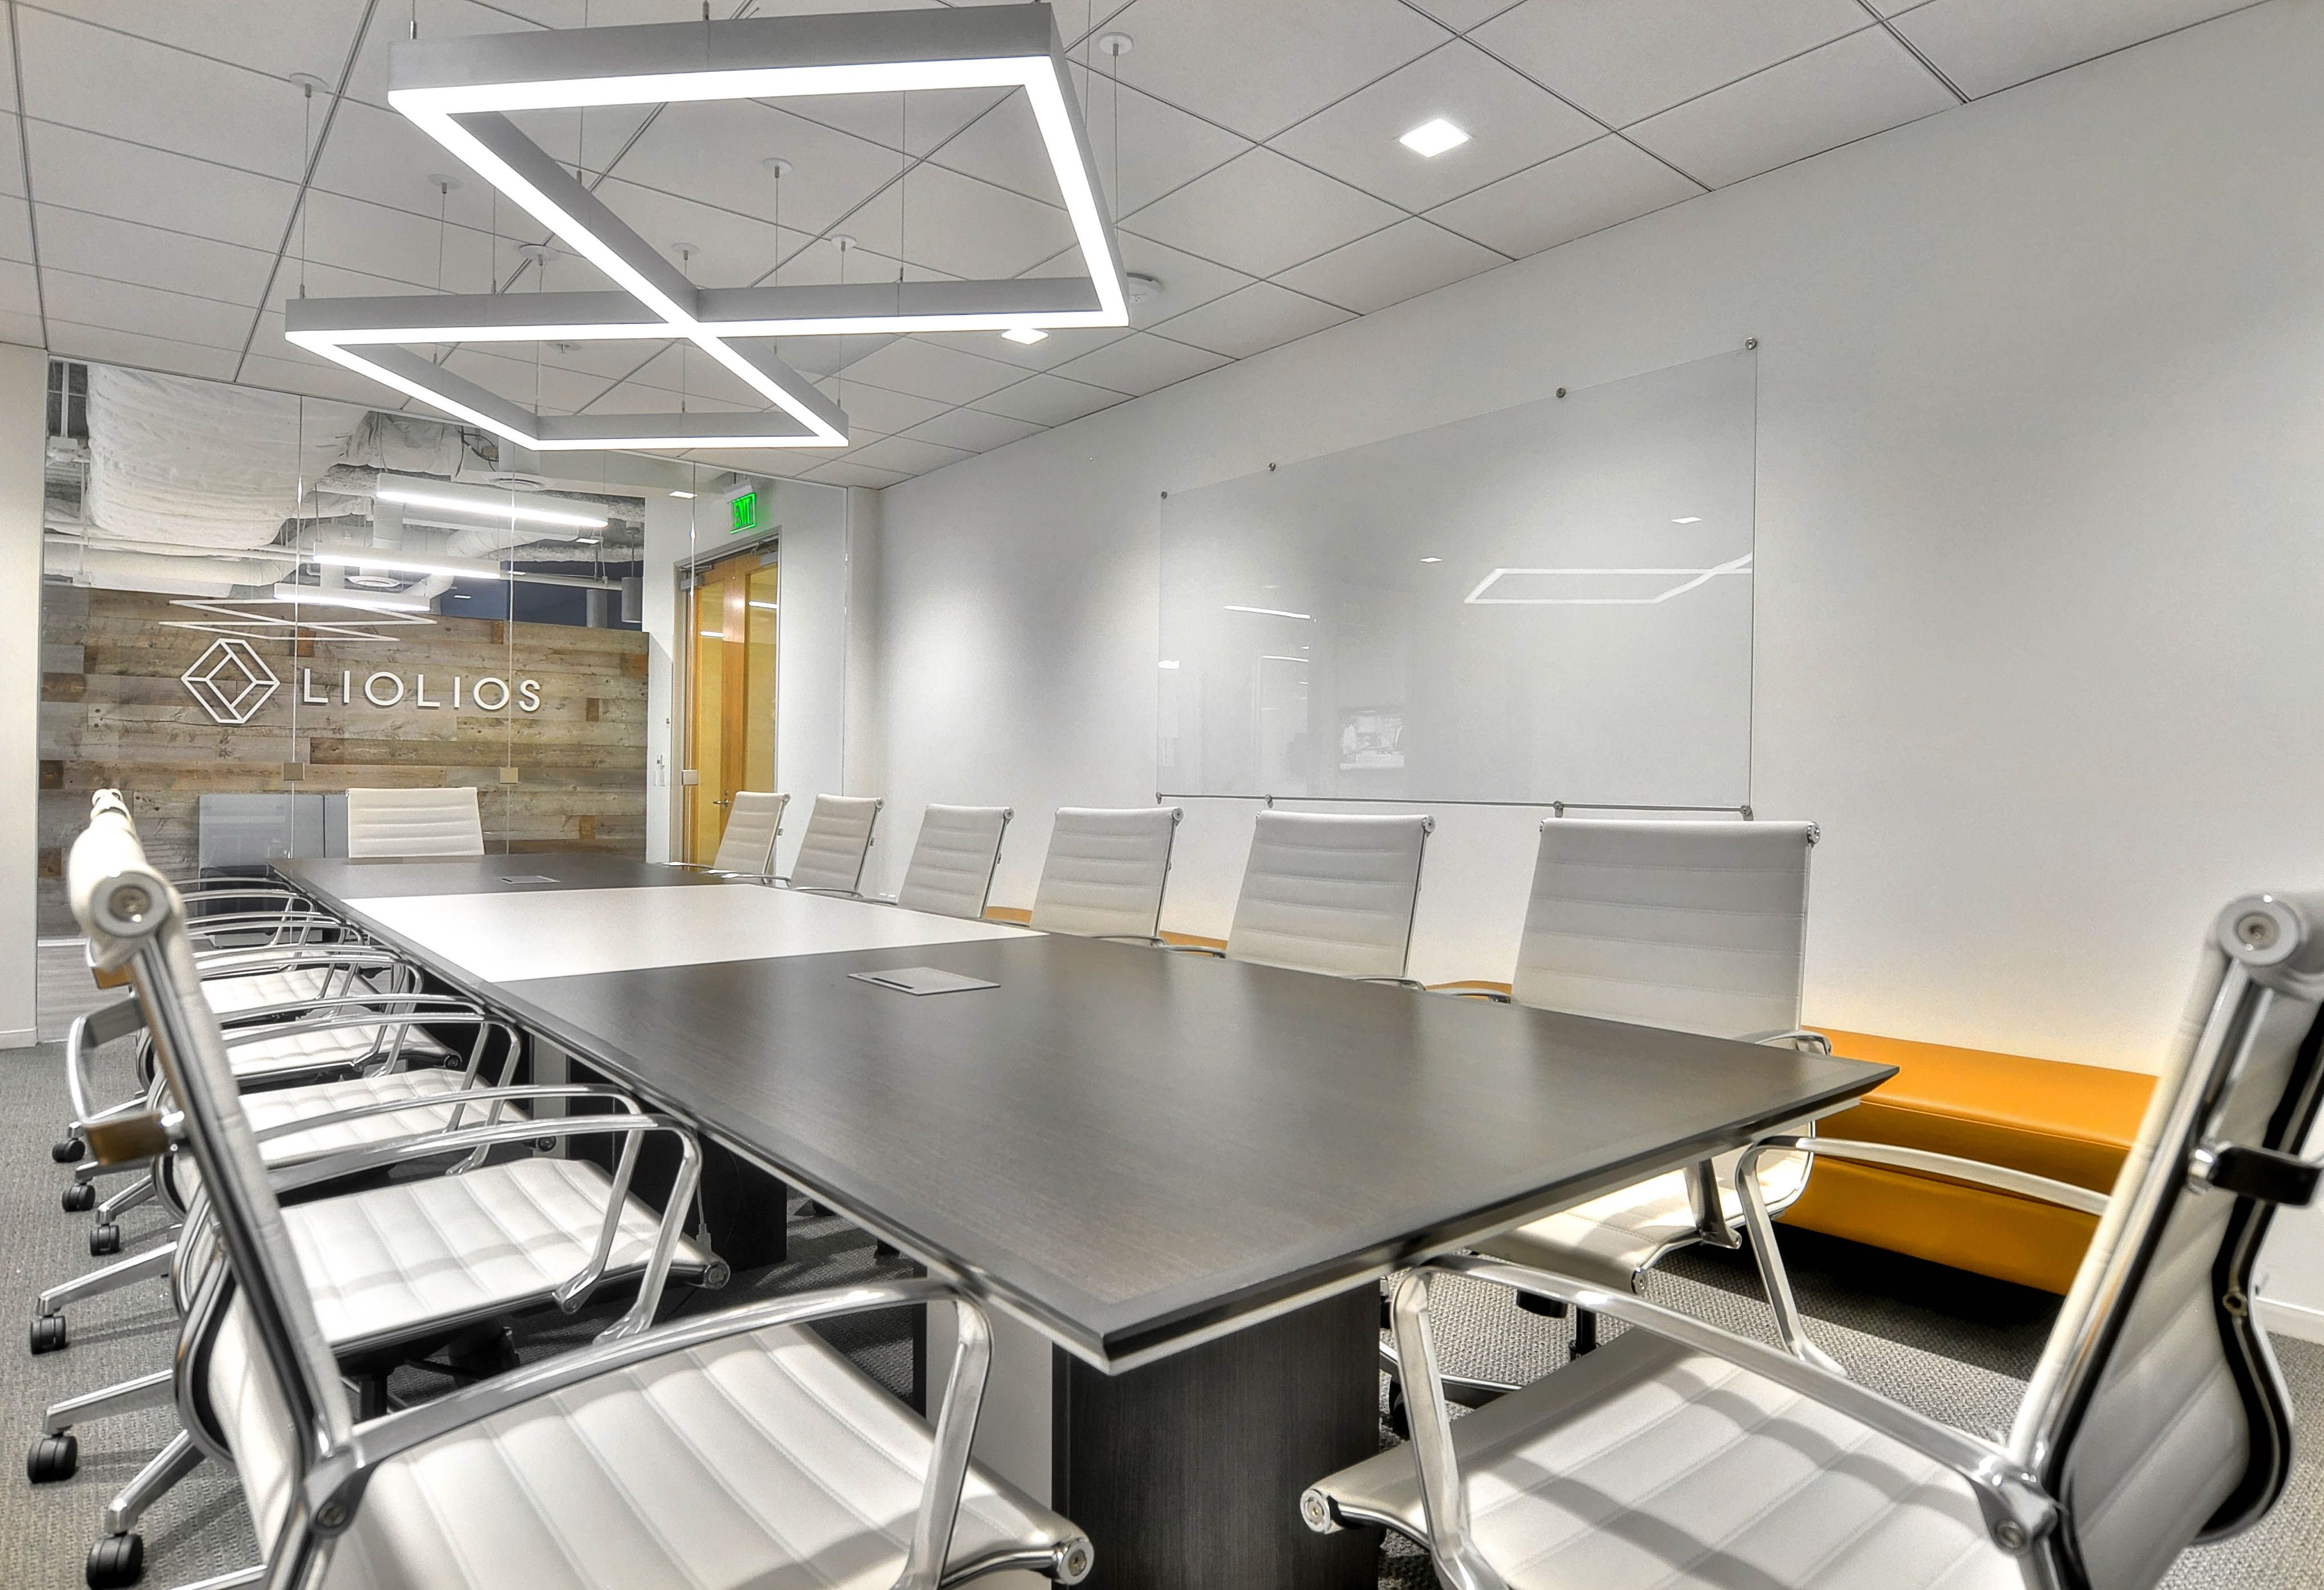 creative office interiors. SOURCE Creative Office Interiors | Liolios